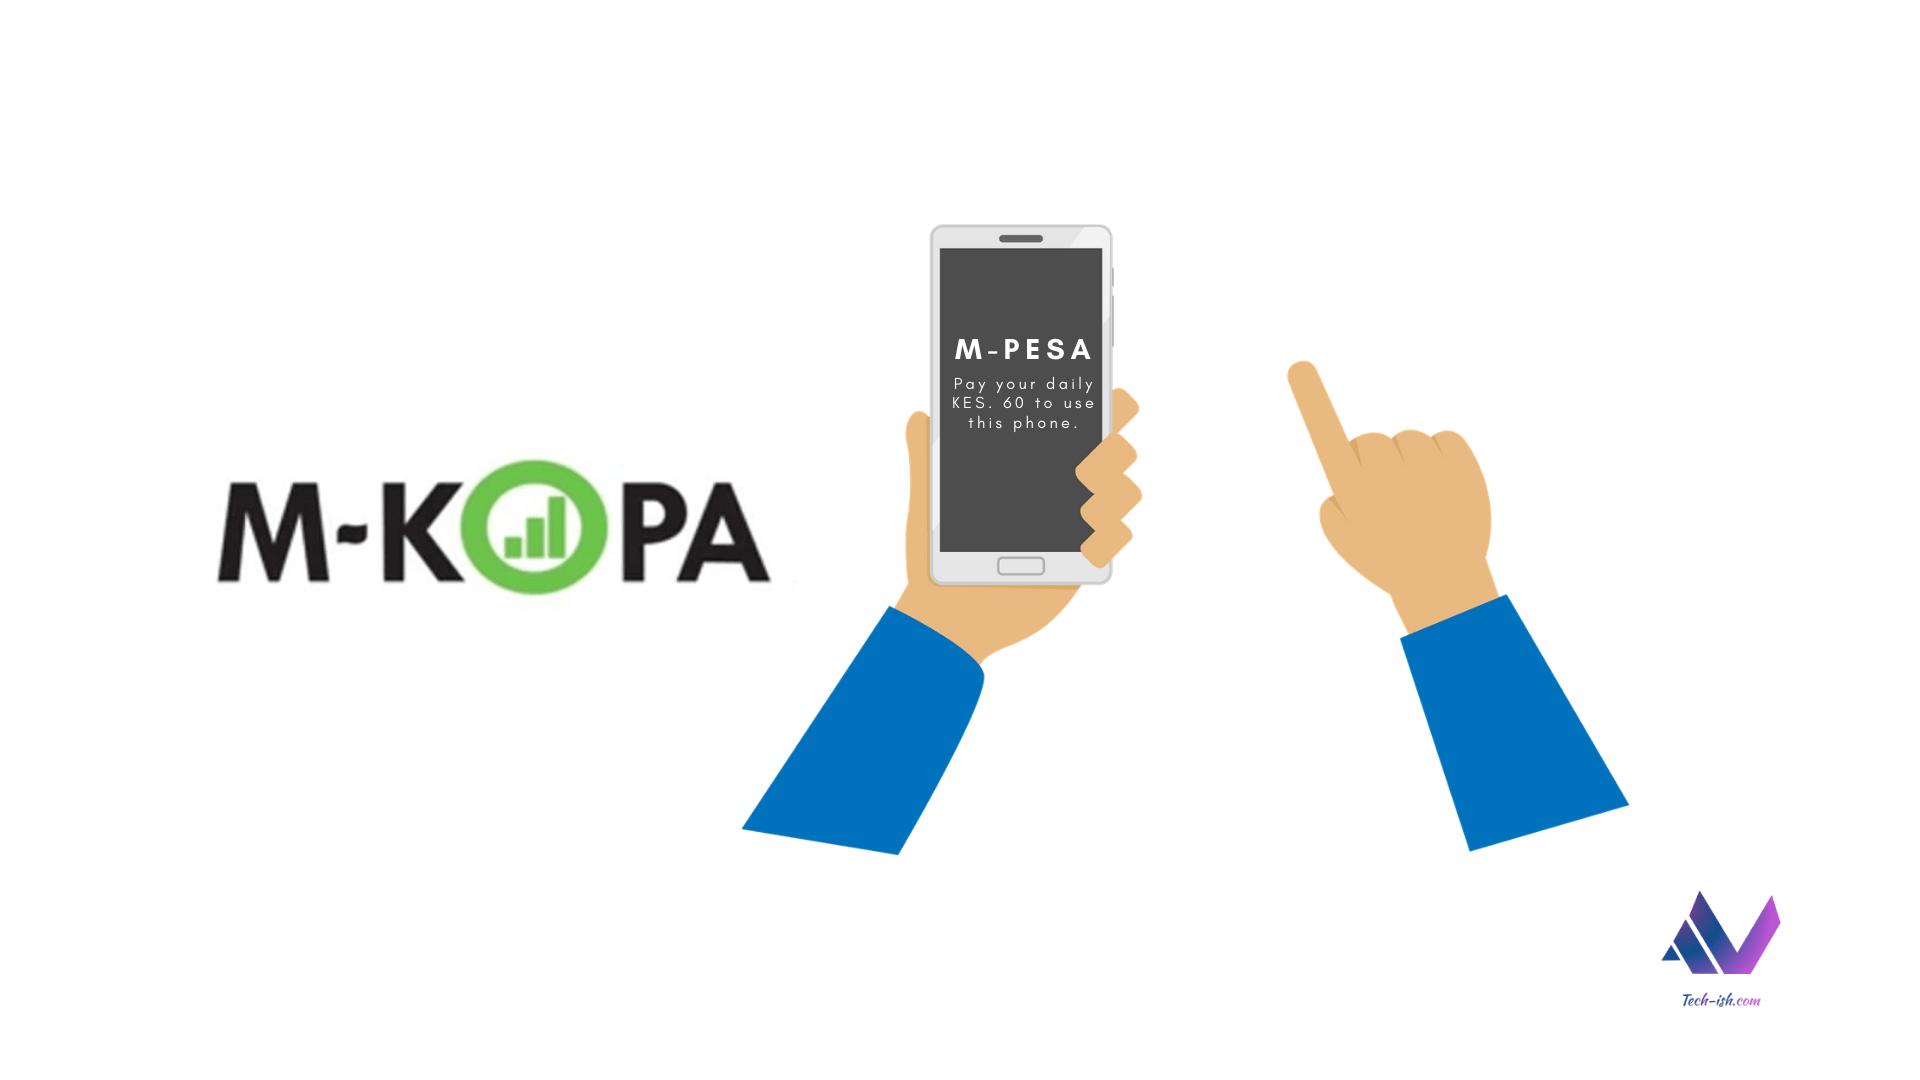 M-Kopa devices  remain popular despite being crazily overpriced